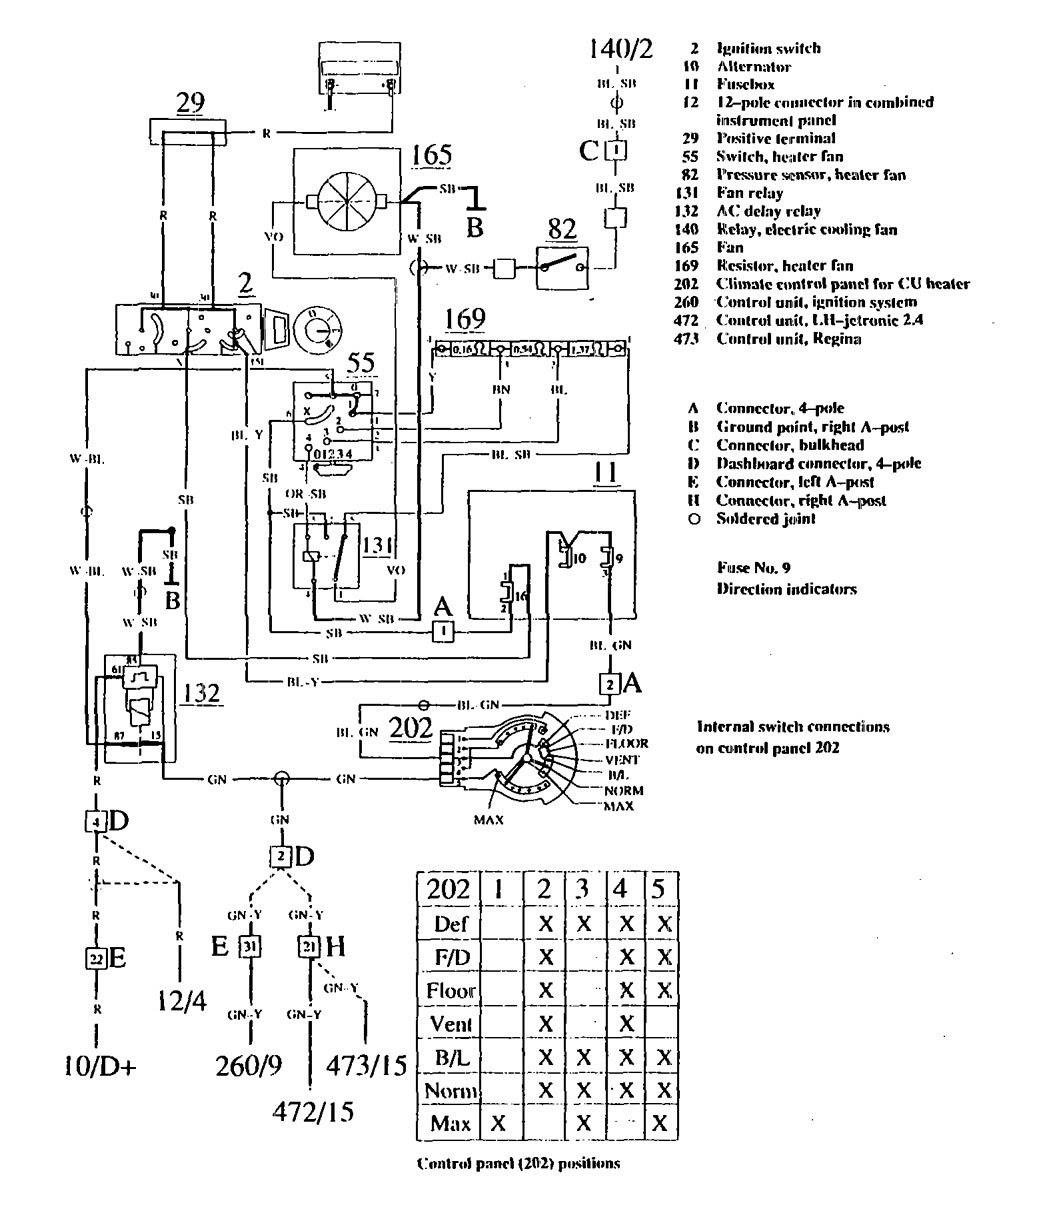 [DIAGRAM] Bmw Z4 Radio Wiring Diagram FULL Version HD